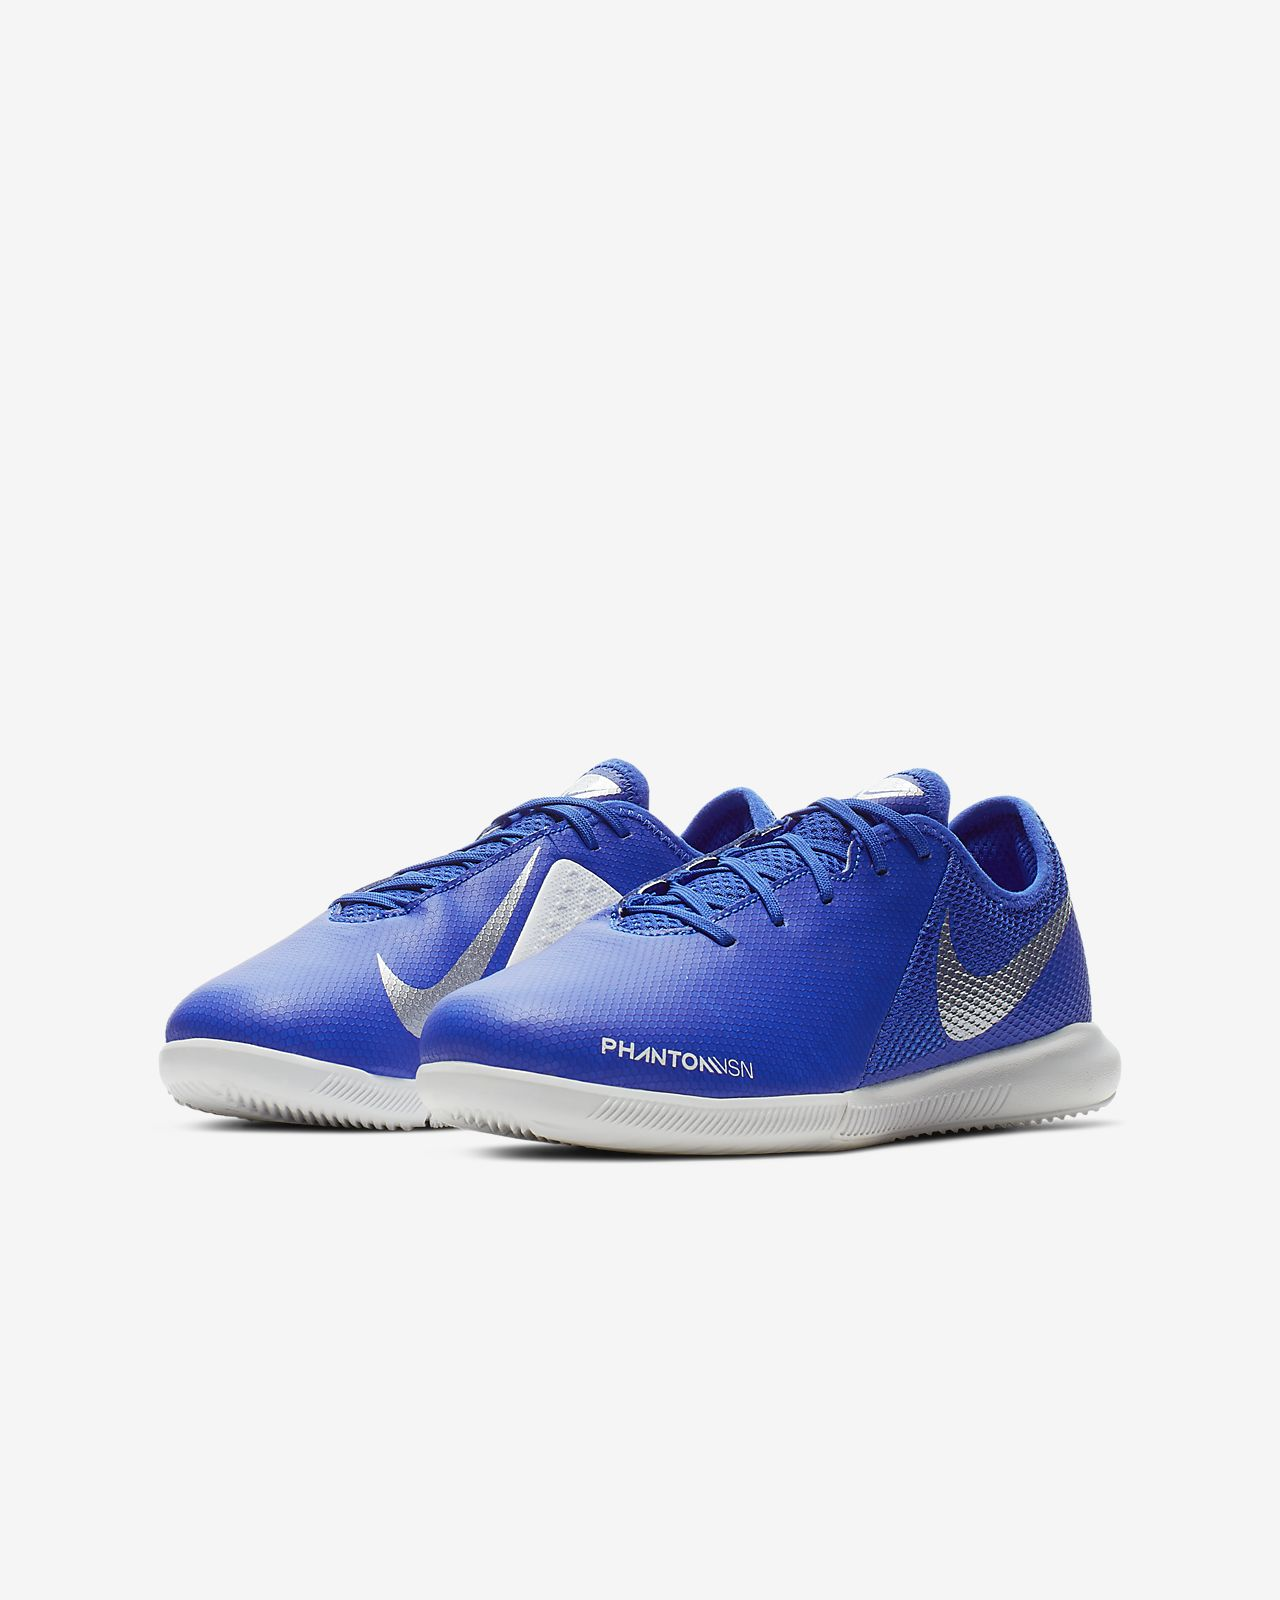 978df7c685a89 ... Nike Jr. Phantom Vision Academy IC Botas de fútbol sala - Niño a y niño